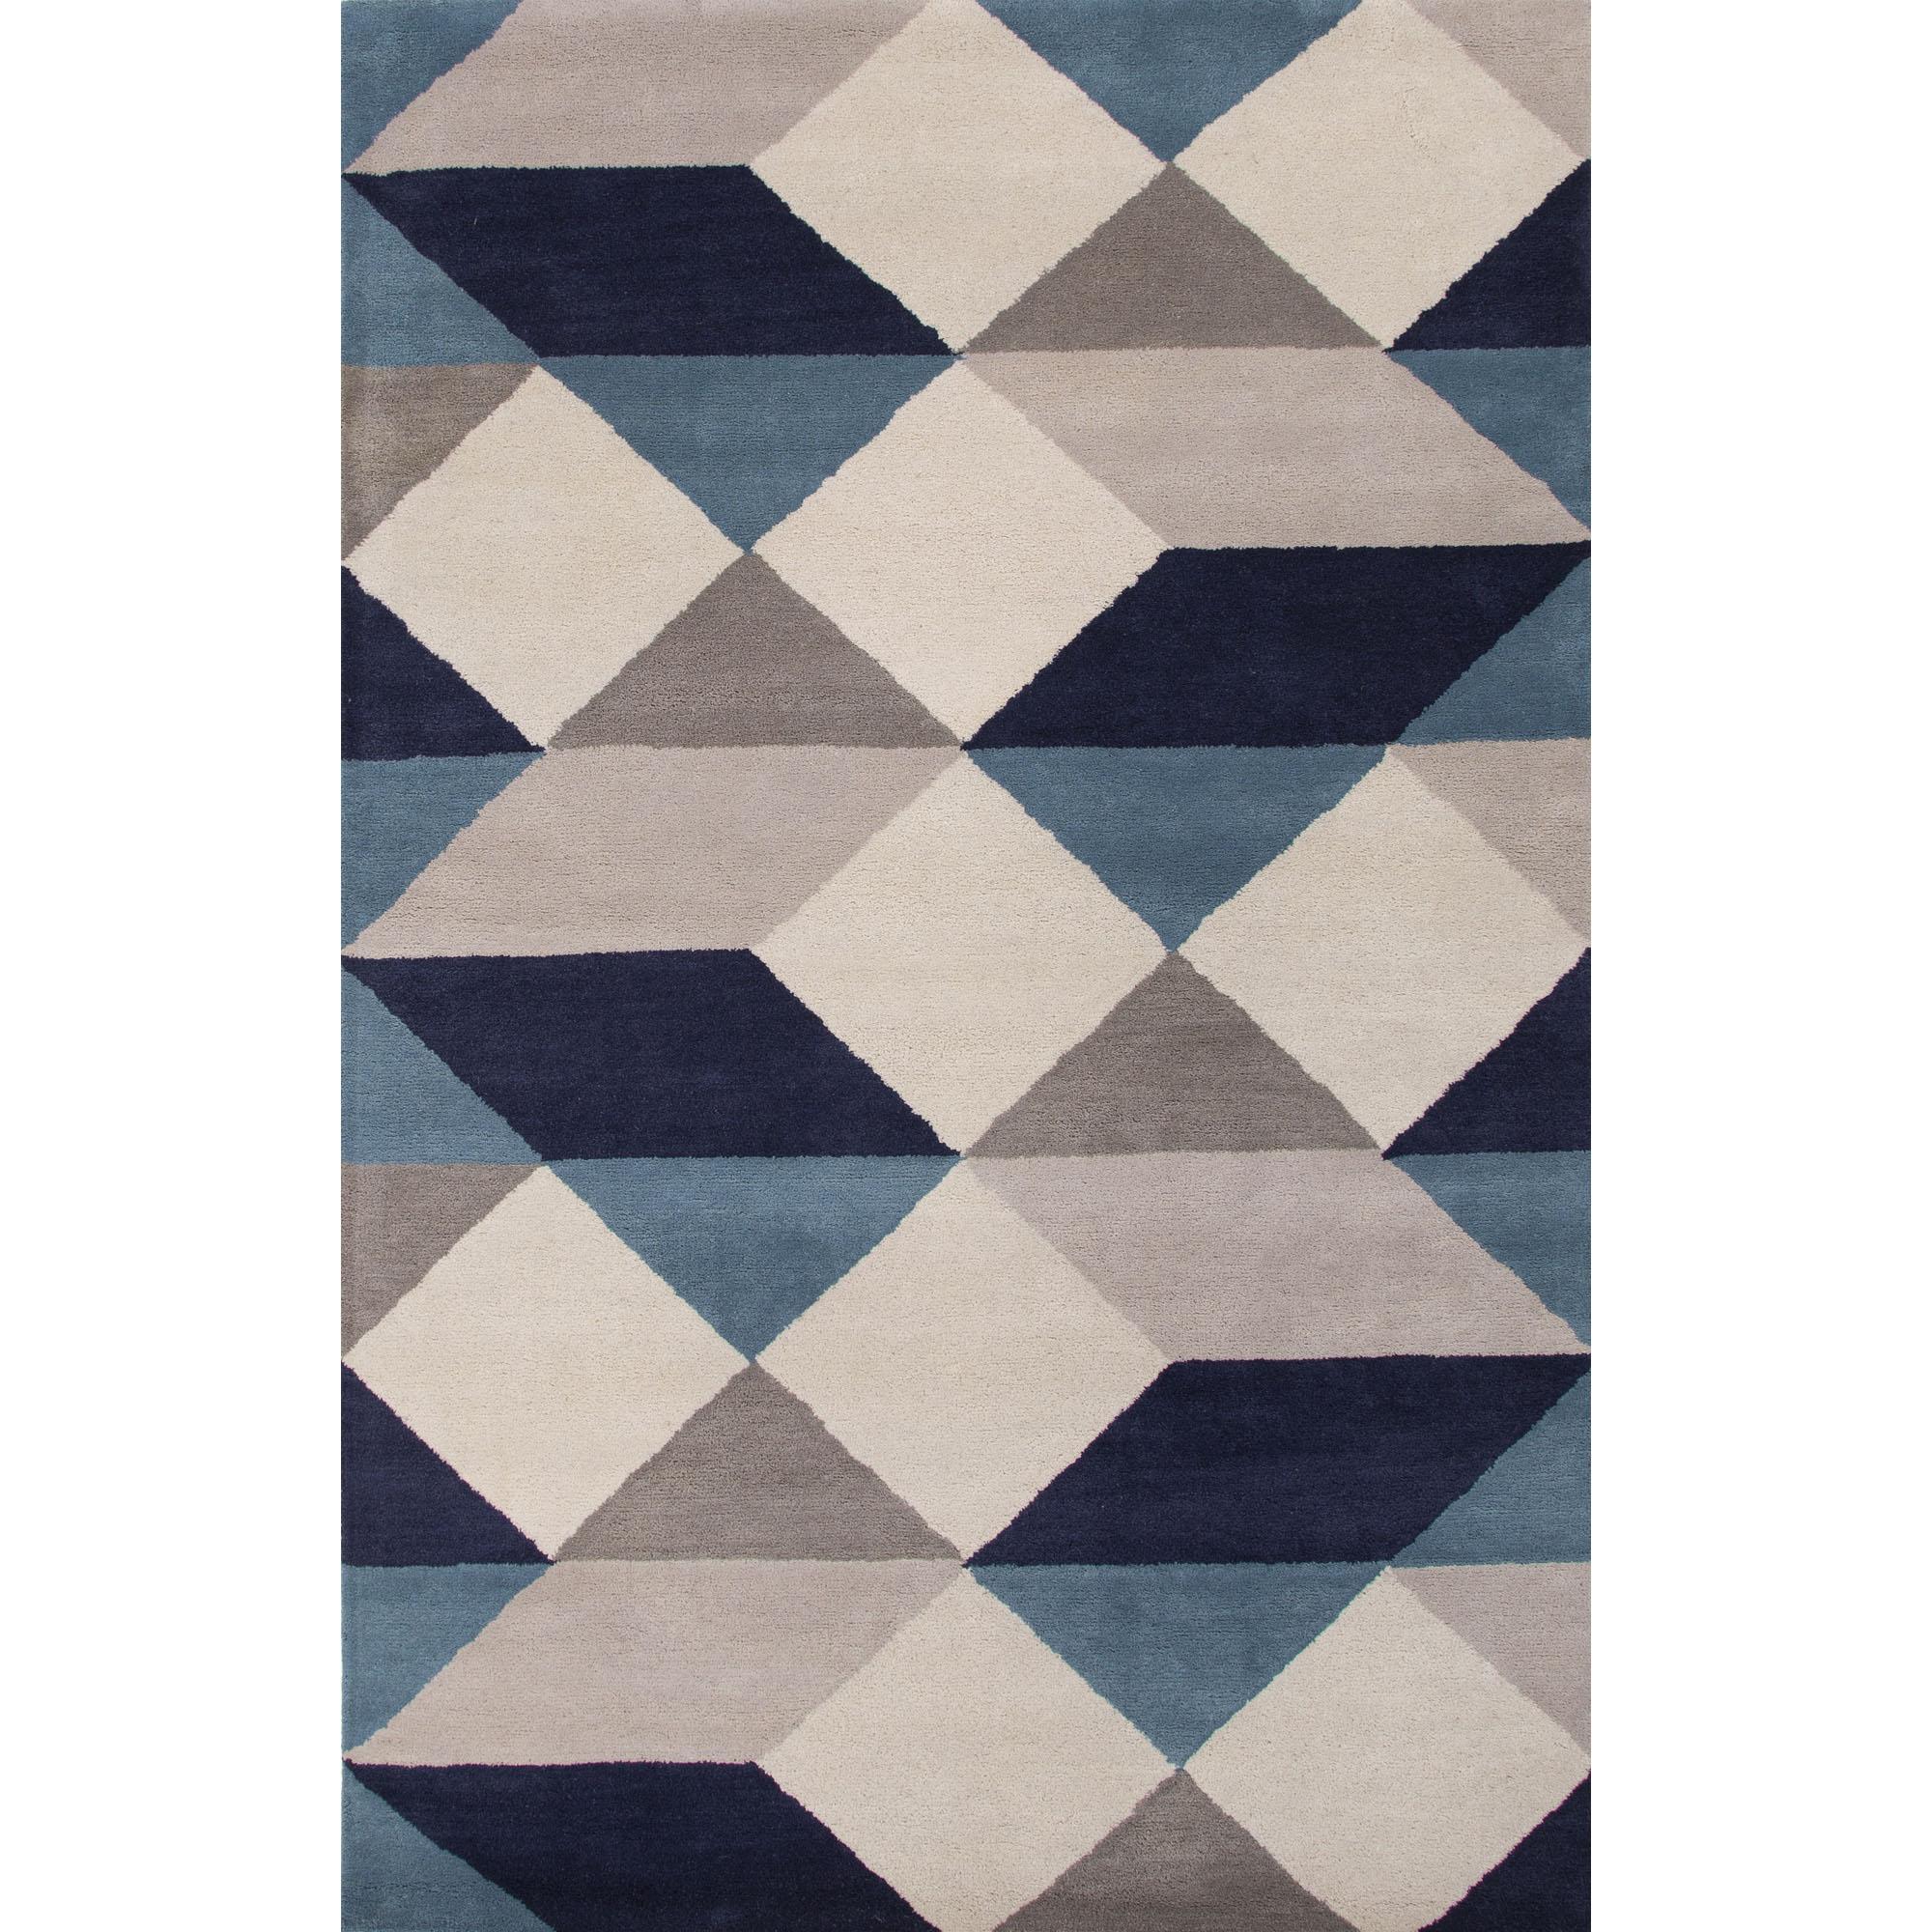 JAIPUR Rugs En Casa By Luli Sanchez Tufted 2 x 3 Rug - Item Number: RUG116796